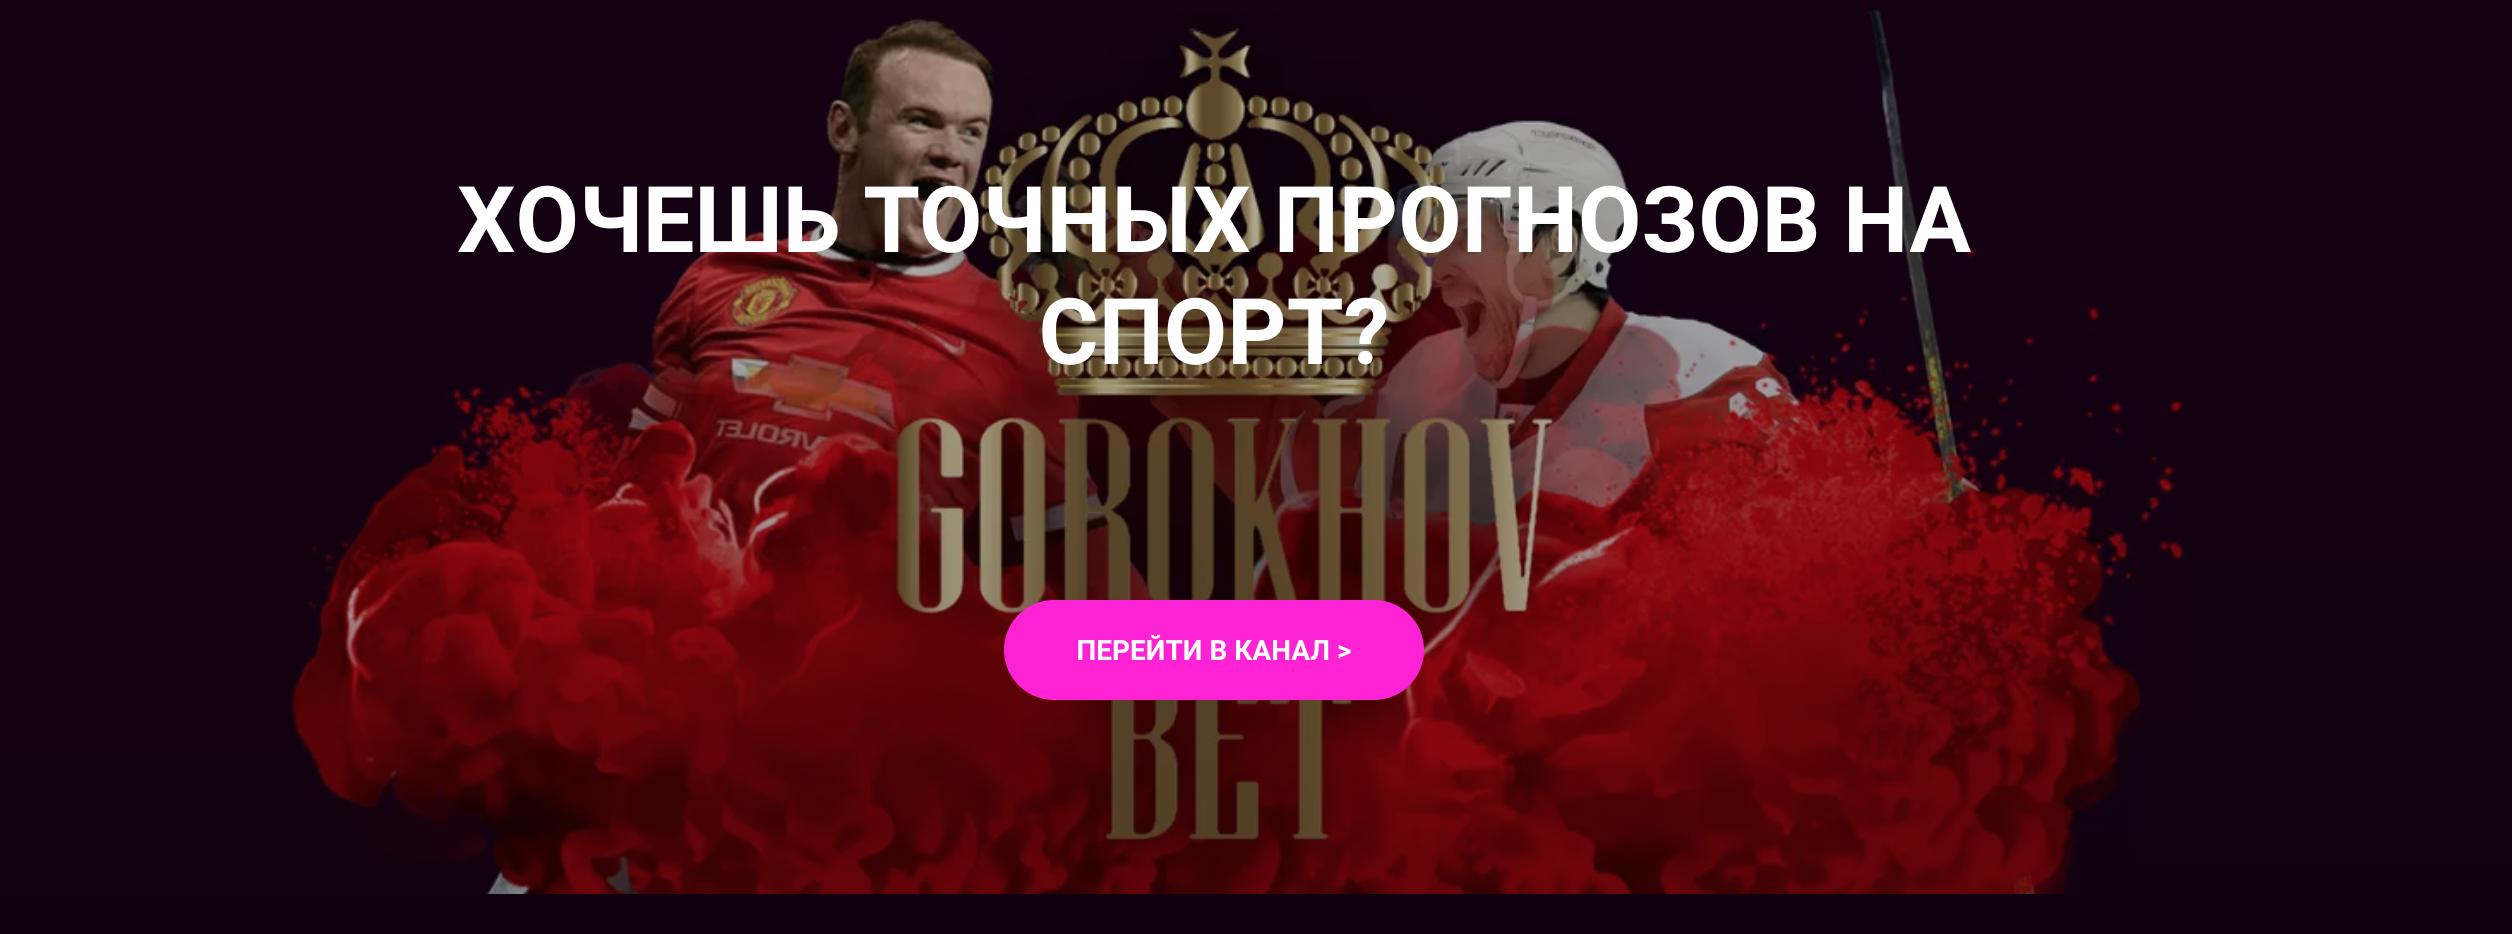 Главная страница сайта Ивана Горохова (IVAN GOROKHOV)